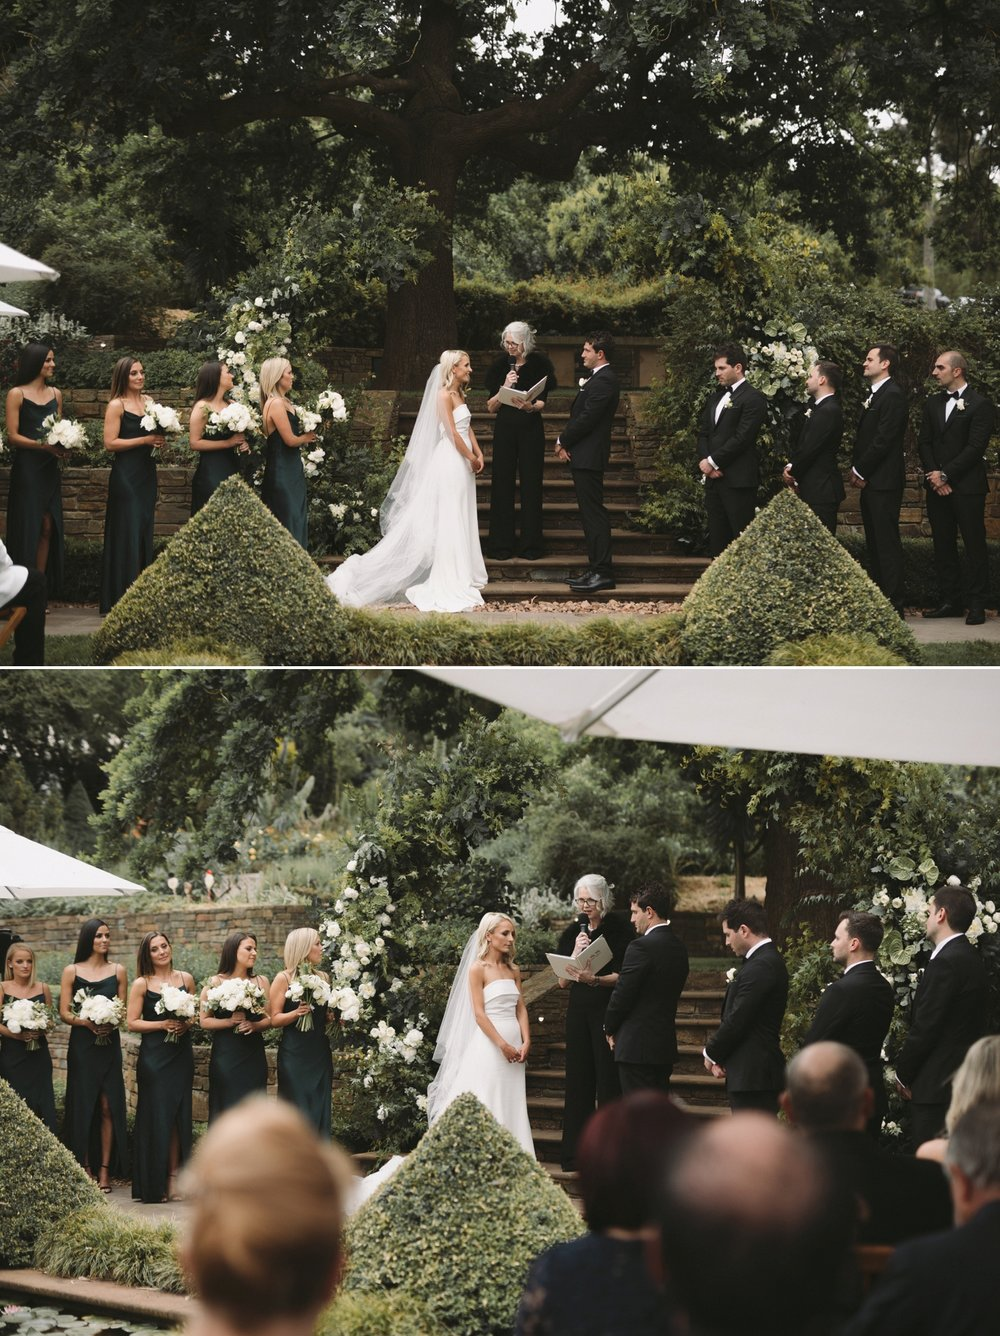 Rebecca & Daniel - Adelaide Hills Private Property Wedding Photographer - Fine Art Wedding Photographer Australia - Katherine Schultz - www.katherineschultzphotography.com_0035.jpg